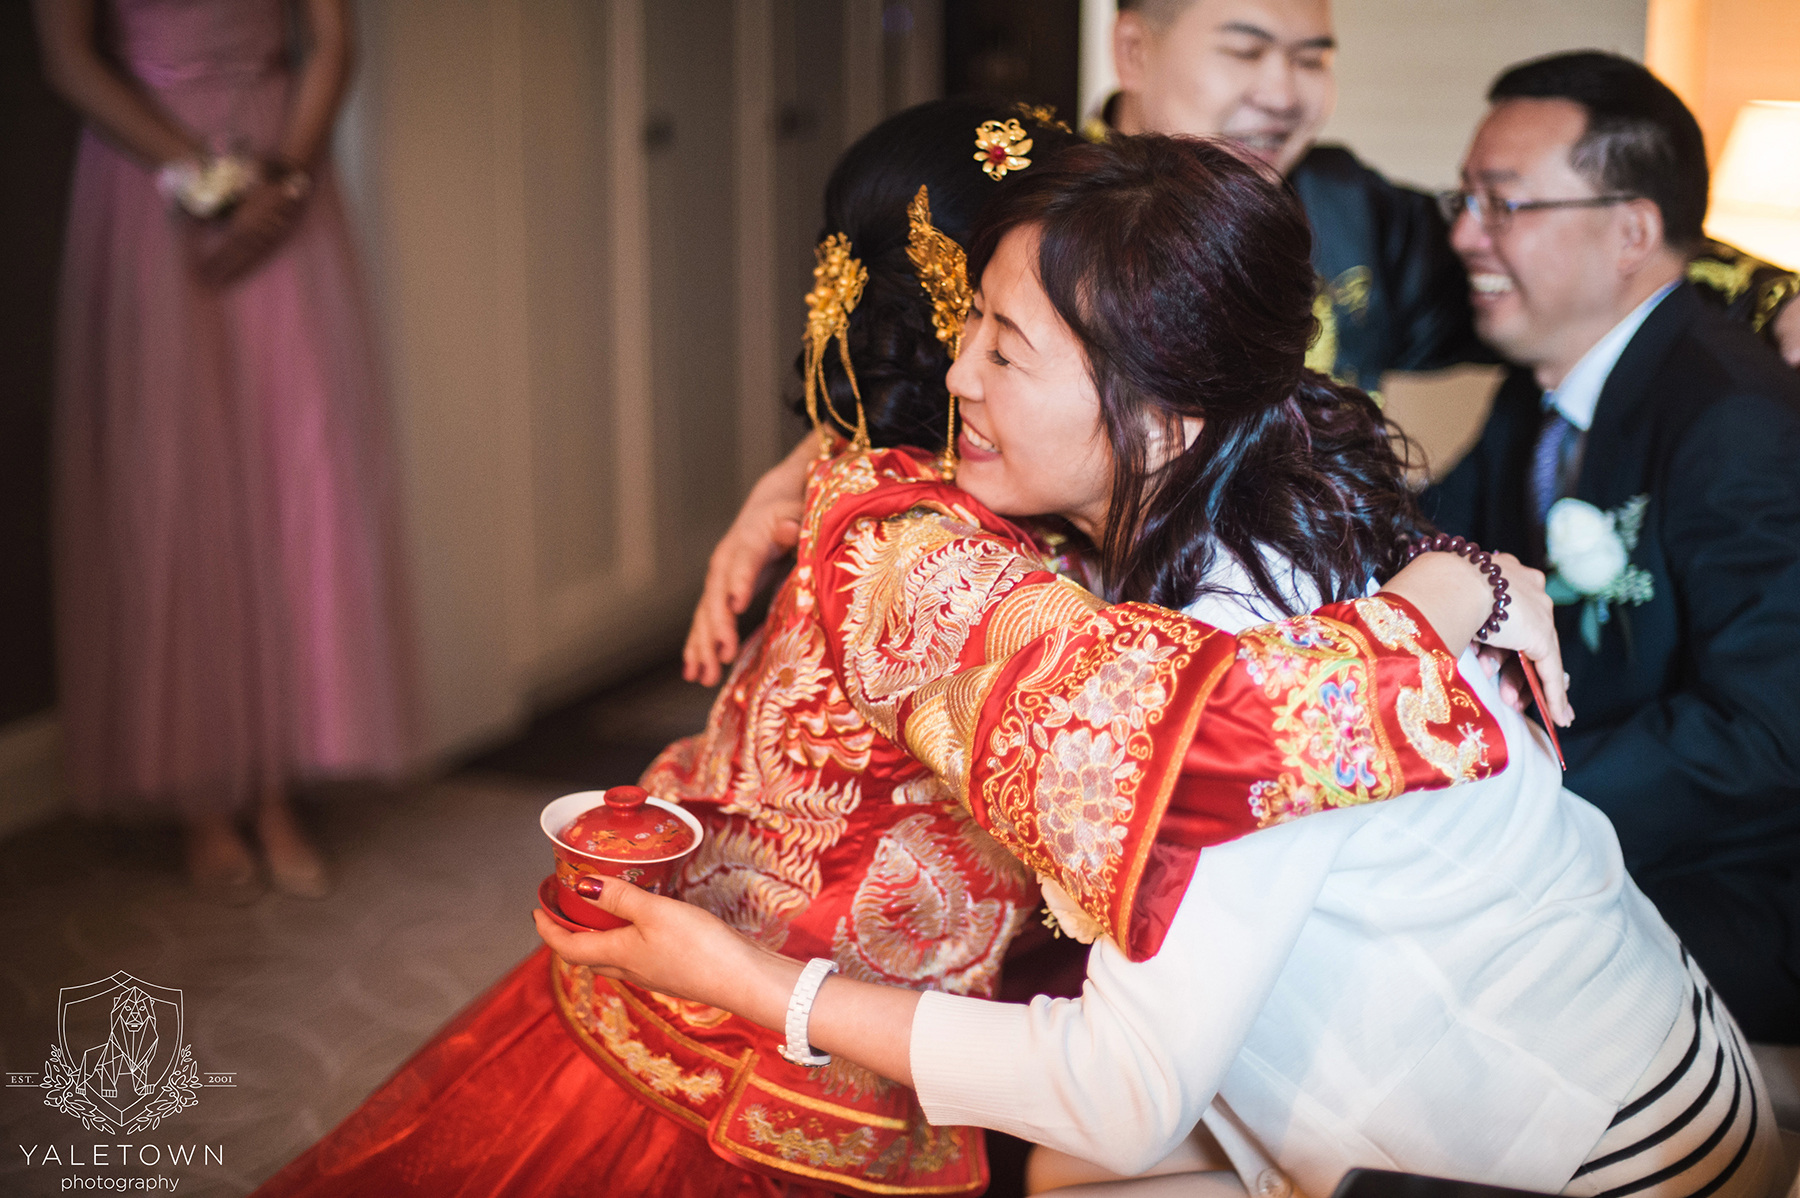 Chinese-Tea-Ceremony-Bride-Groom-Rosewood-Hotel-Georgia-Vancouver-Wedding-Yaletown-Photography-photo